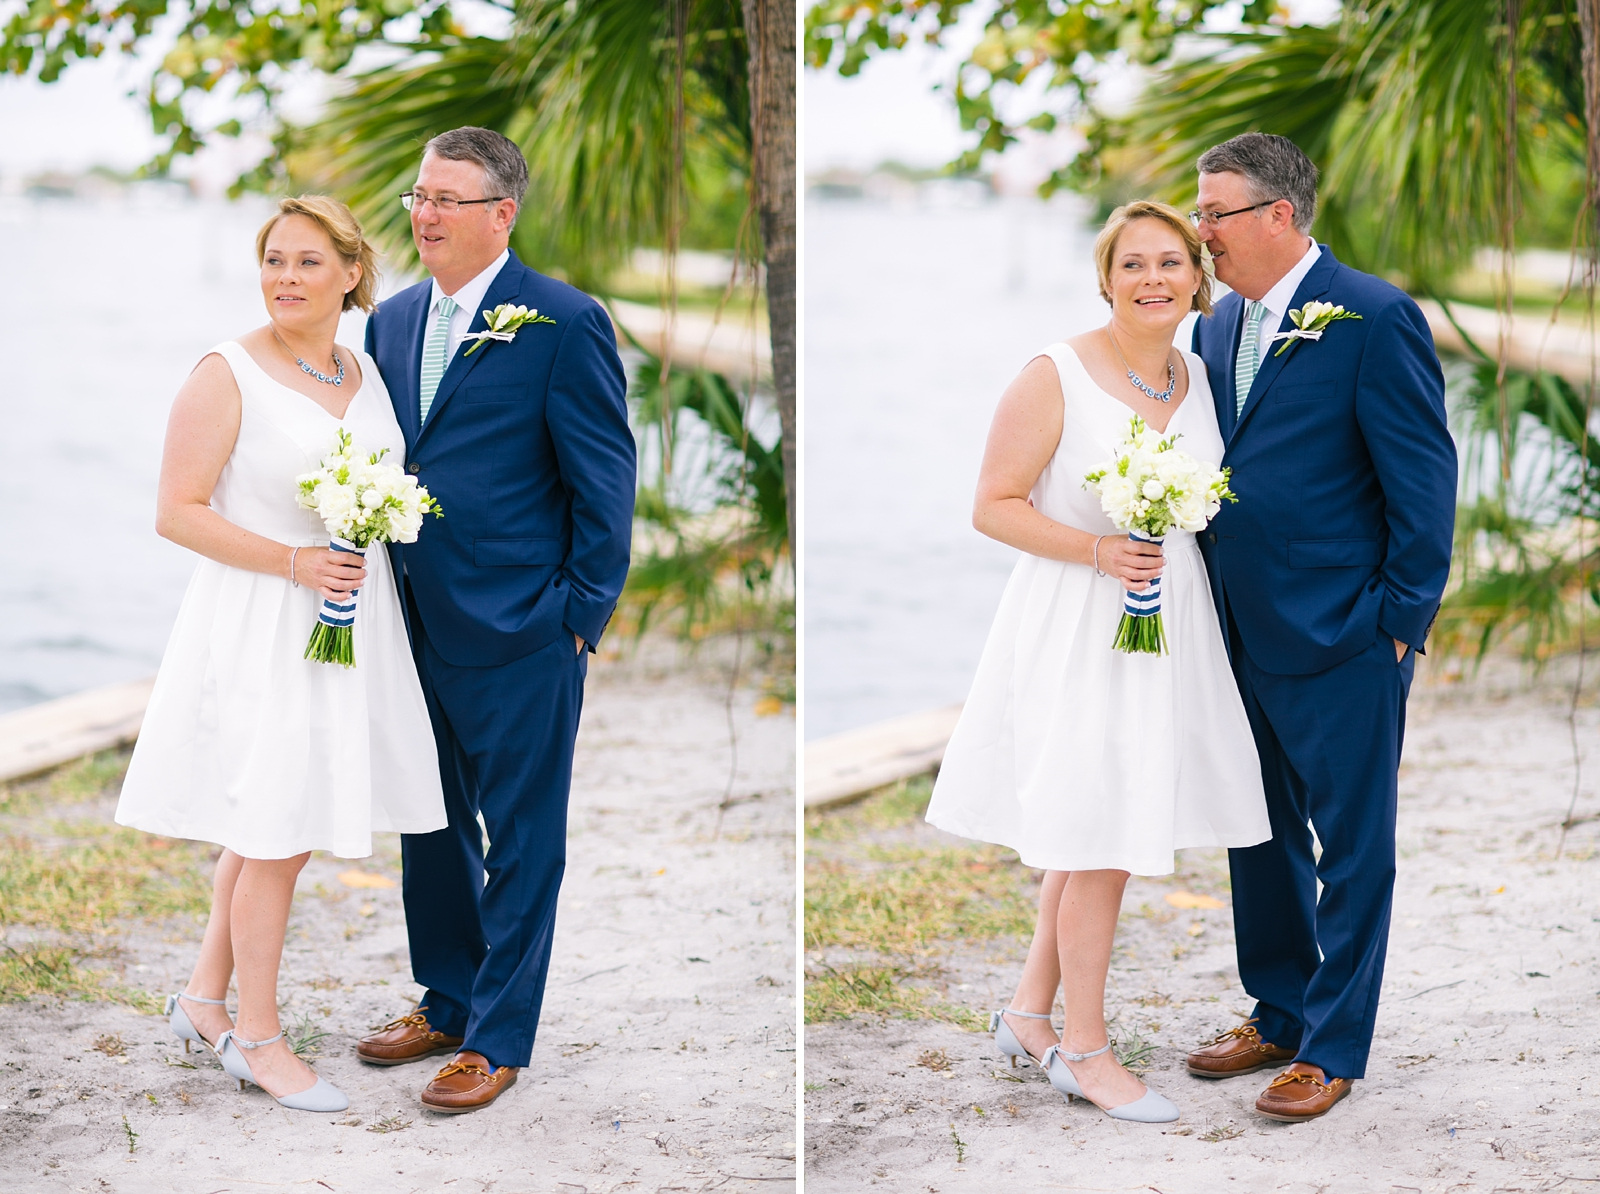 22-los-angeles-wedding-photographer-fort-lauderdale.jpg